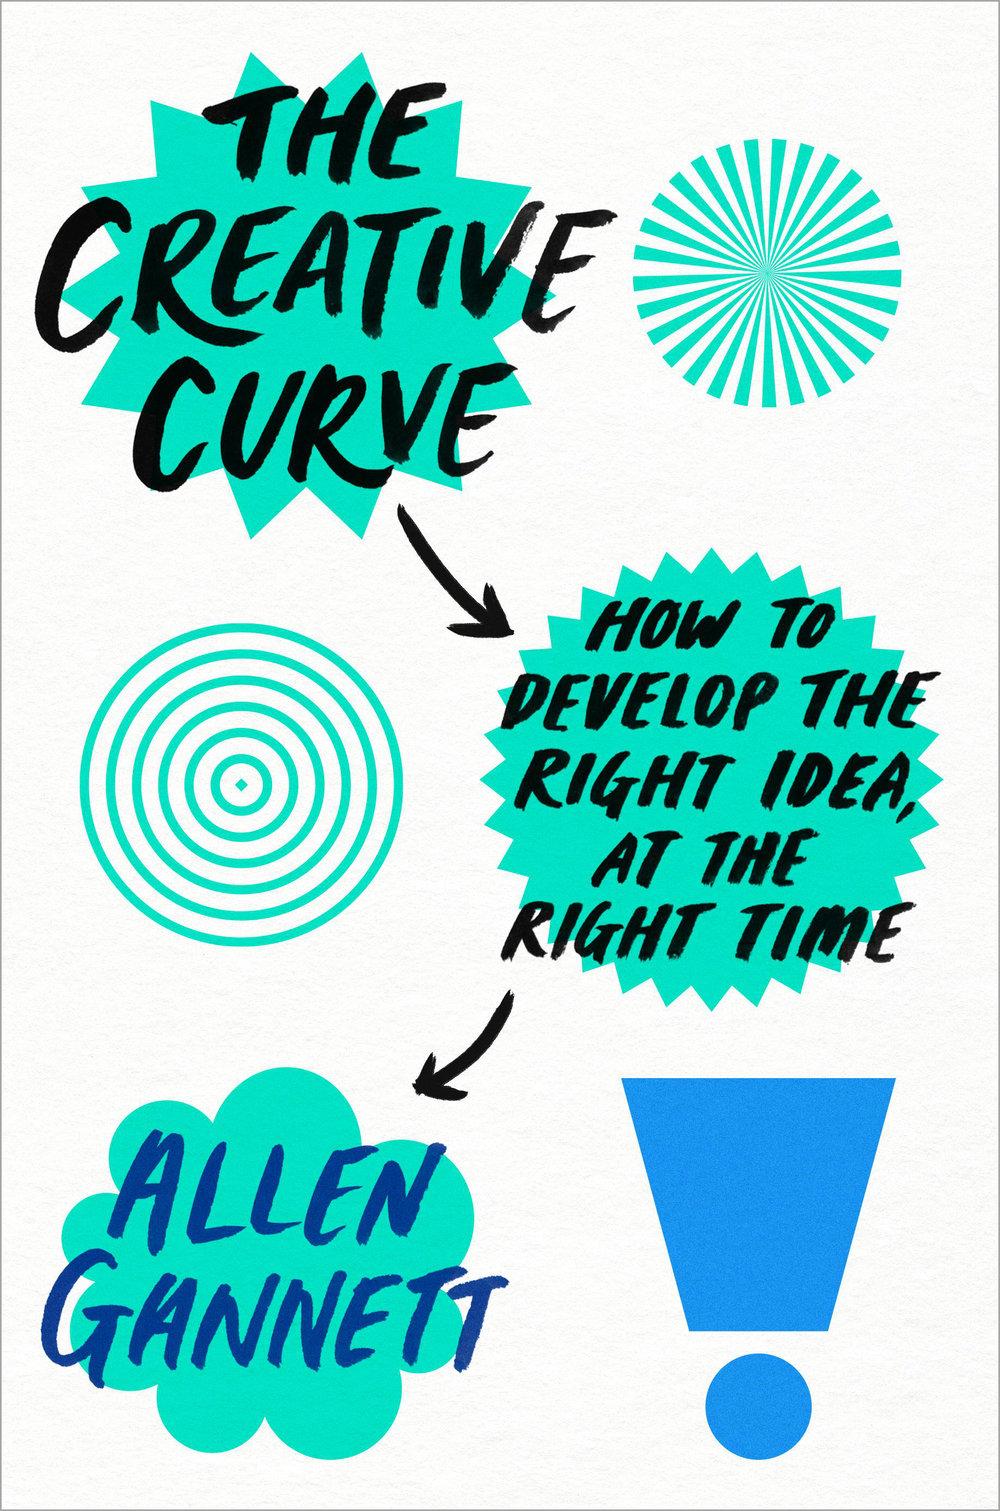 The Creative Curve